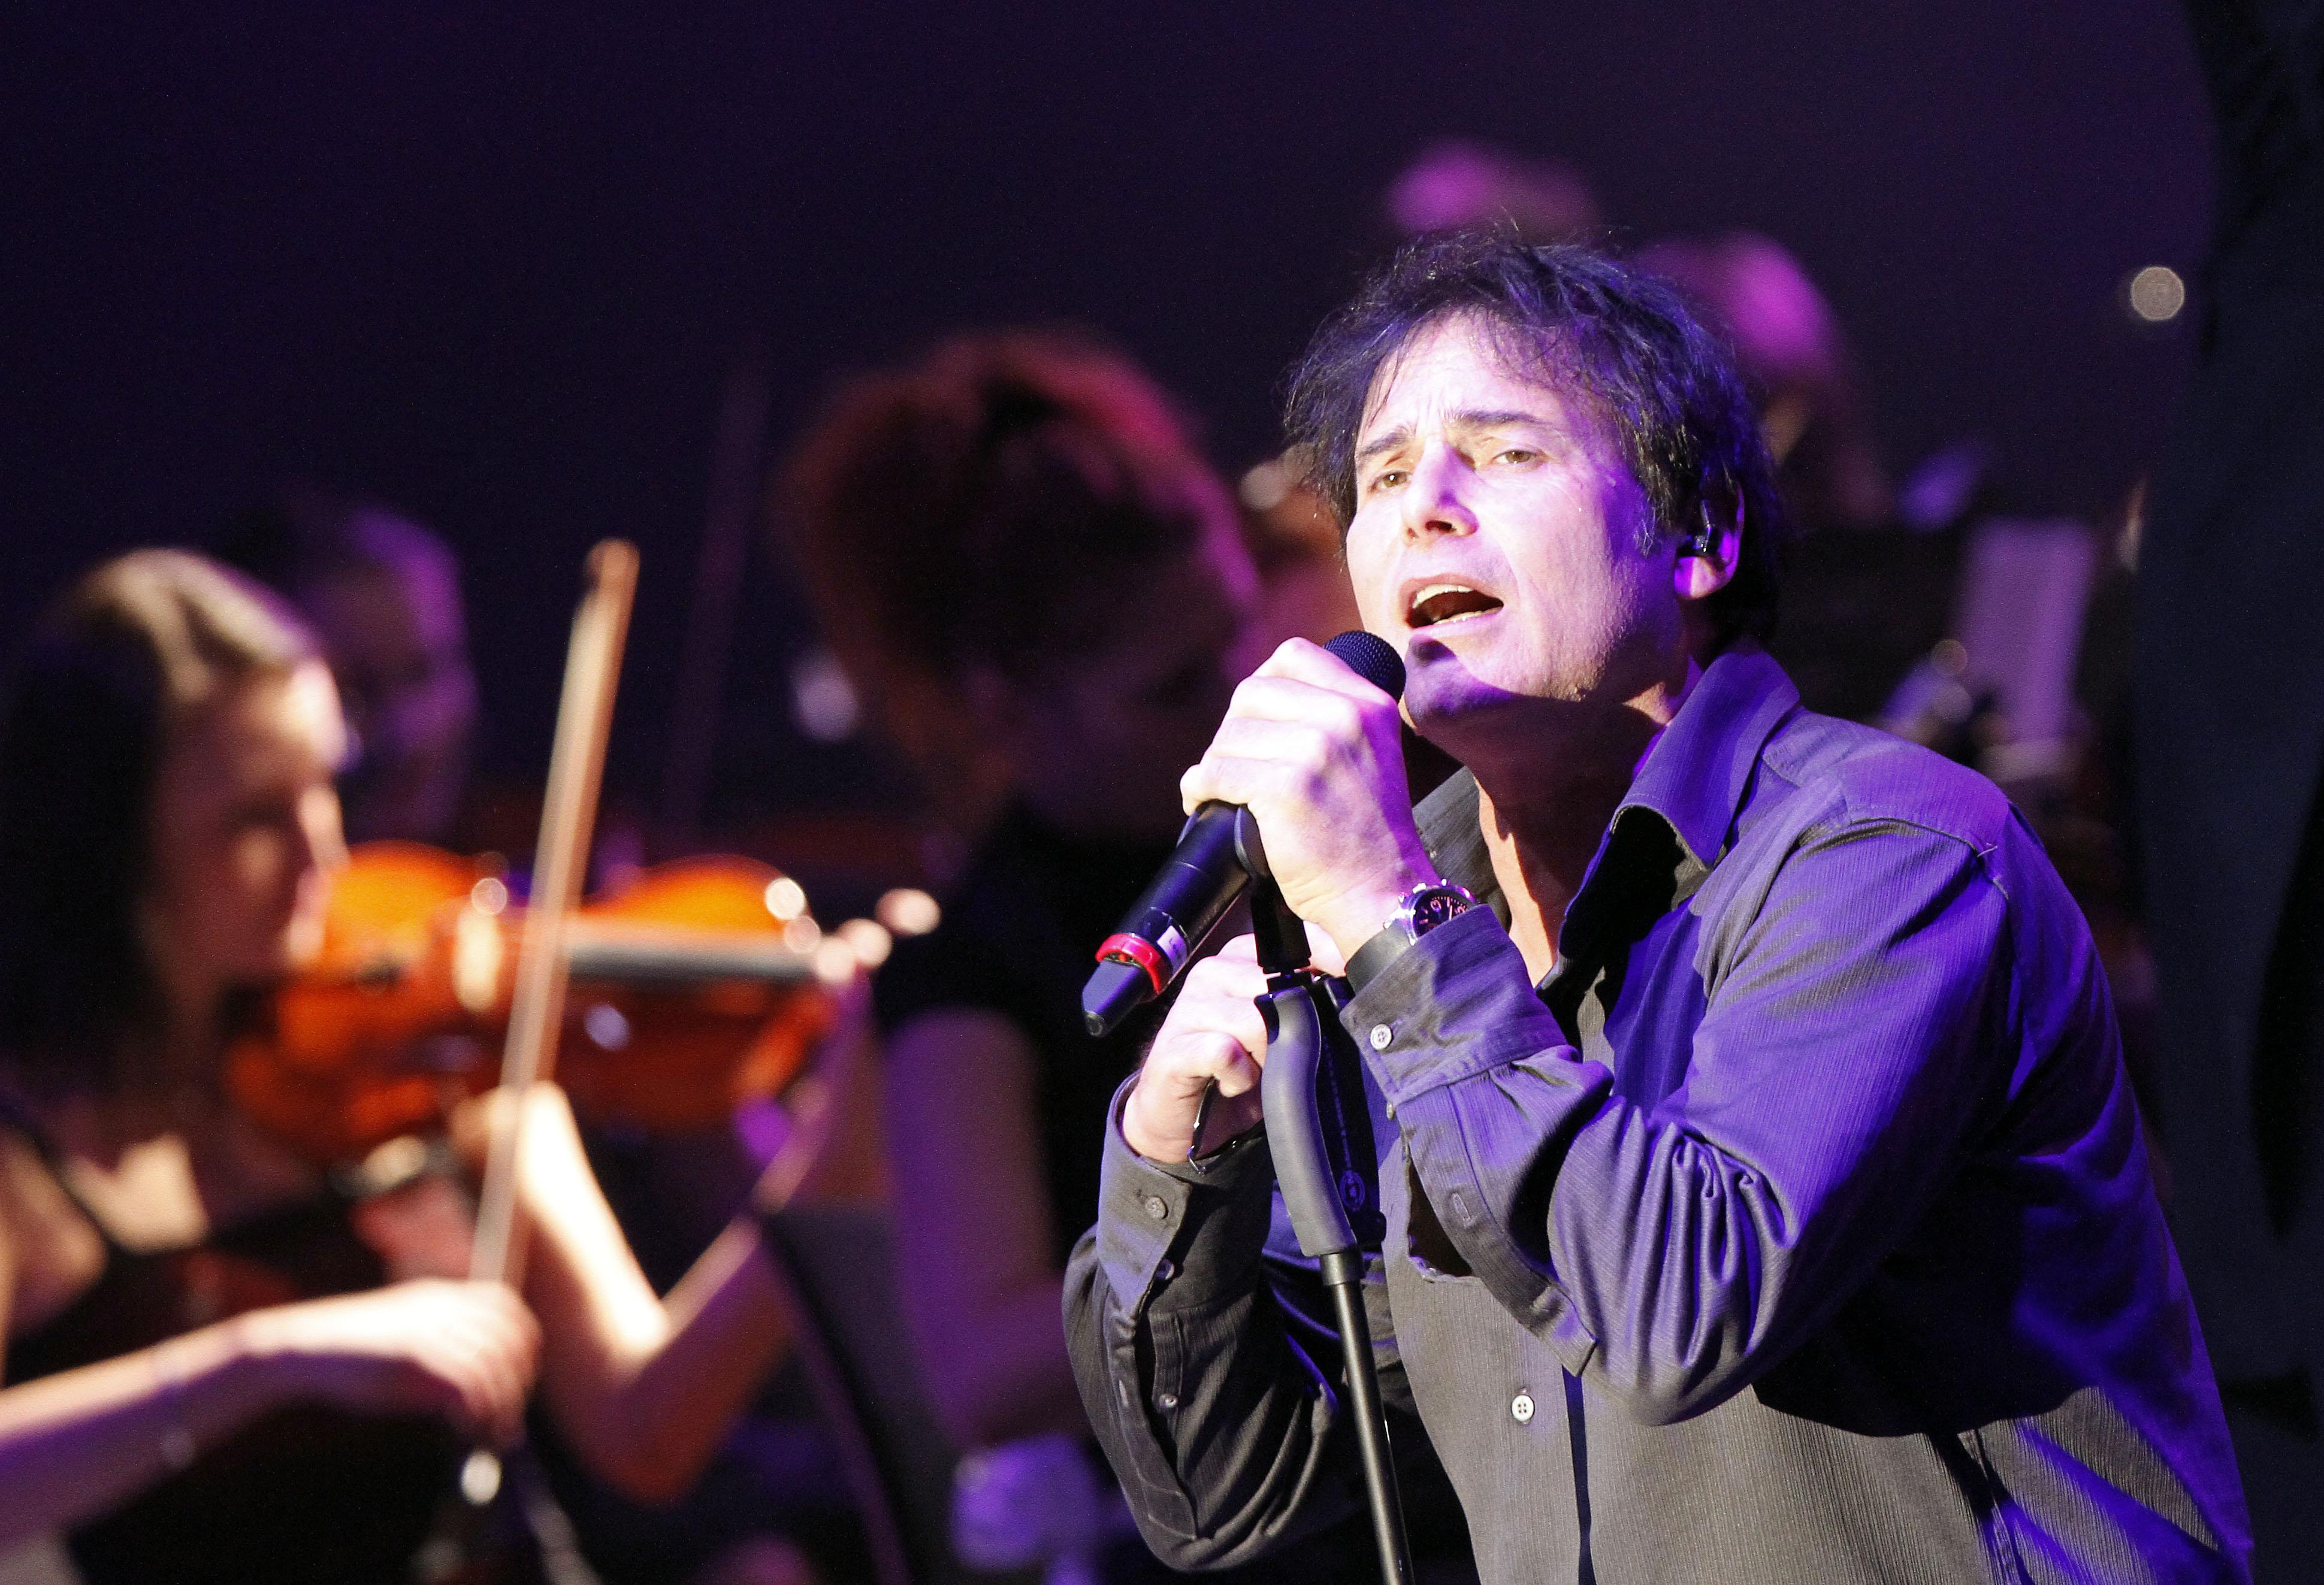 jimi jamison survivor lead singer dead at 63 rolling stone